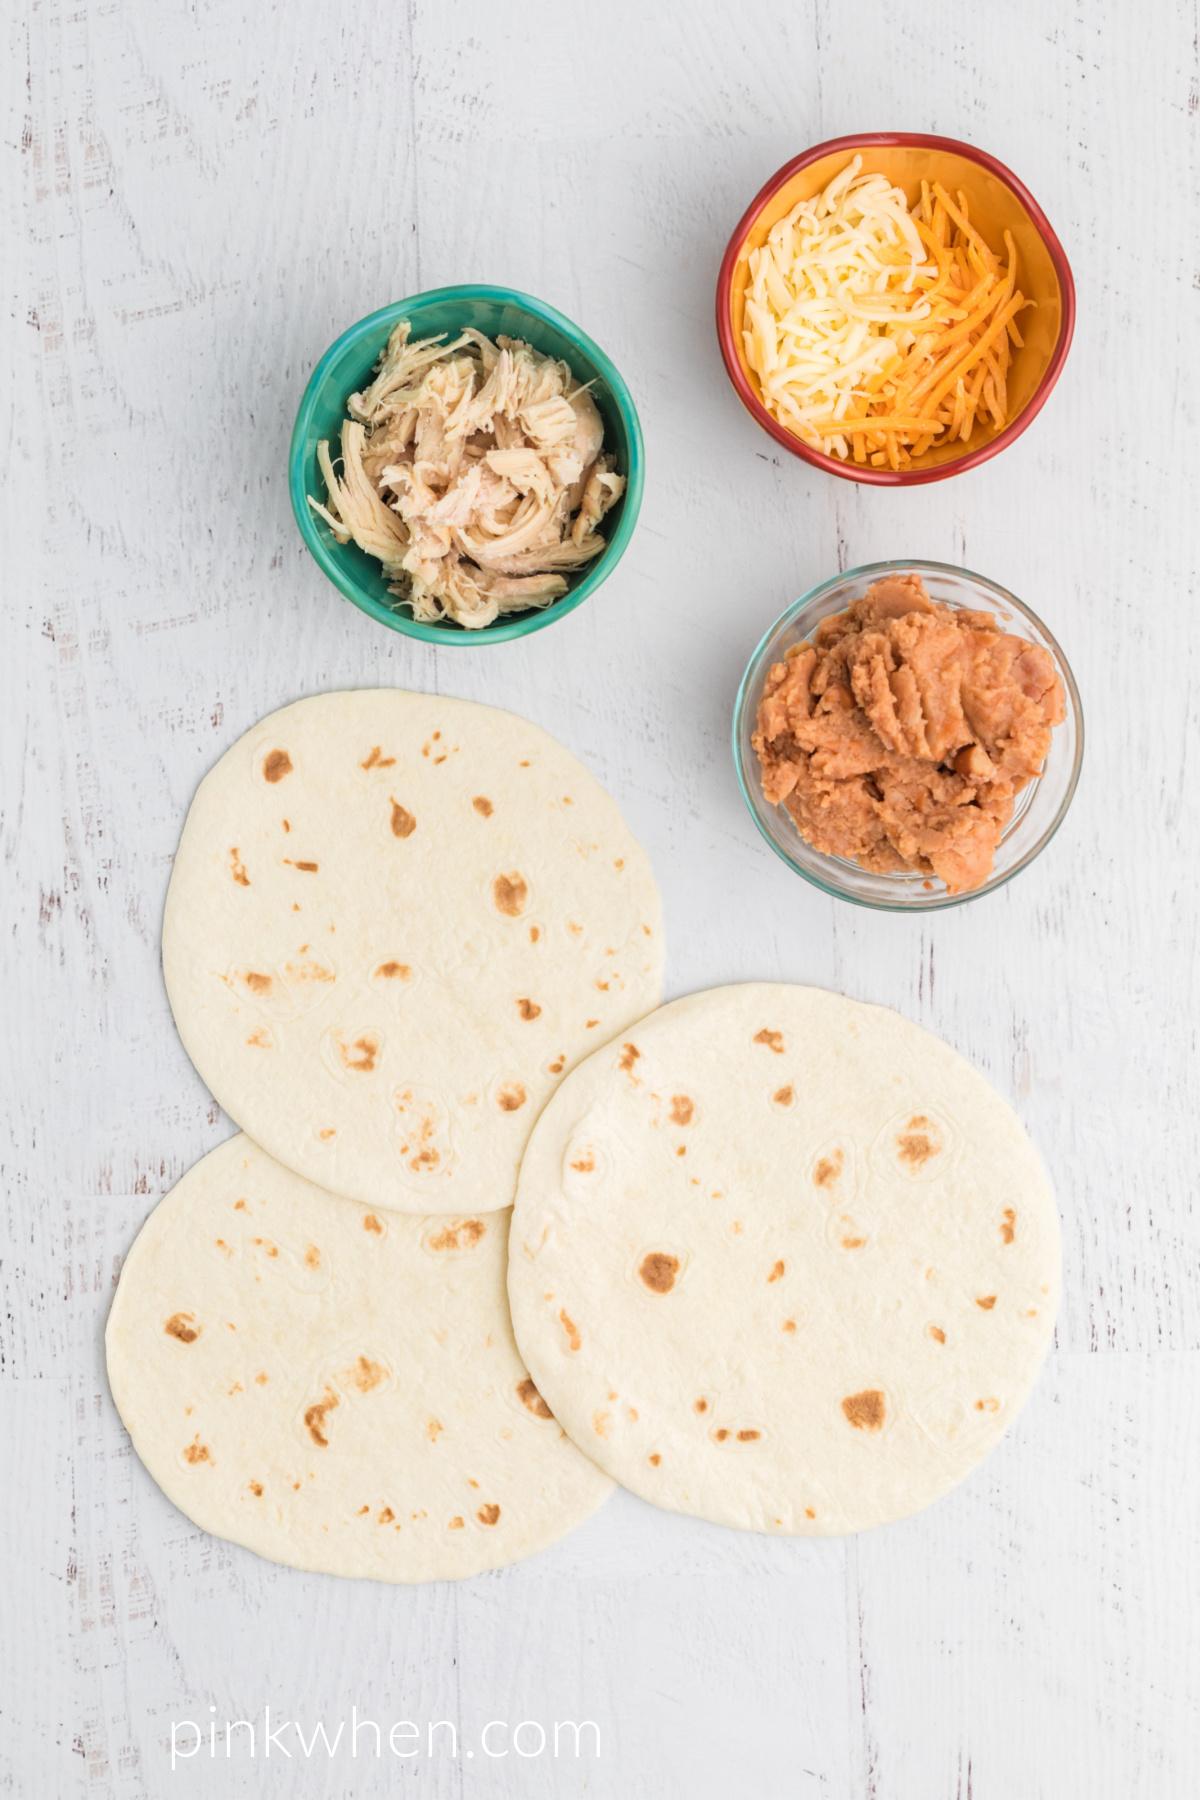 Ingredients needed to make quesadillas in the air fryer.